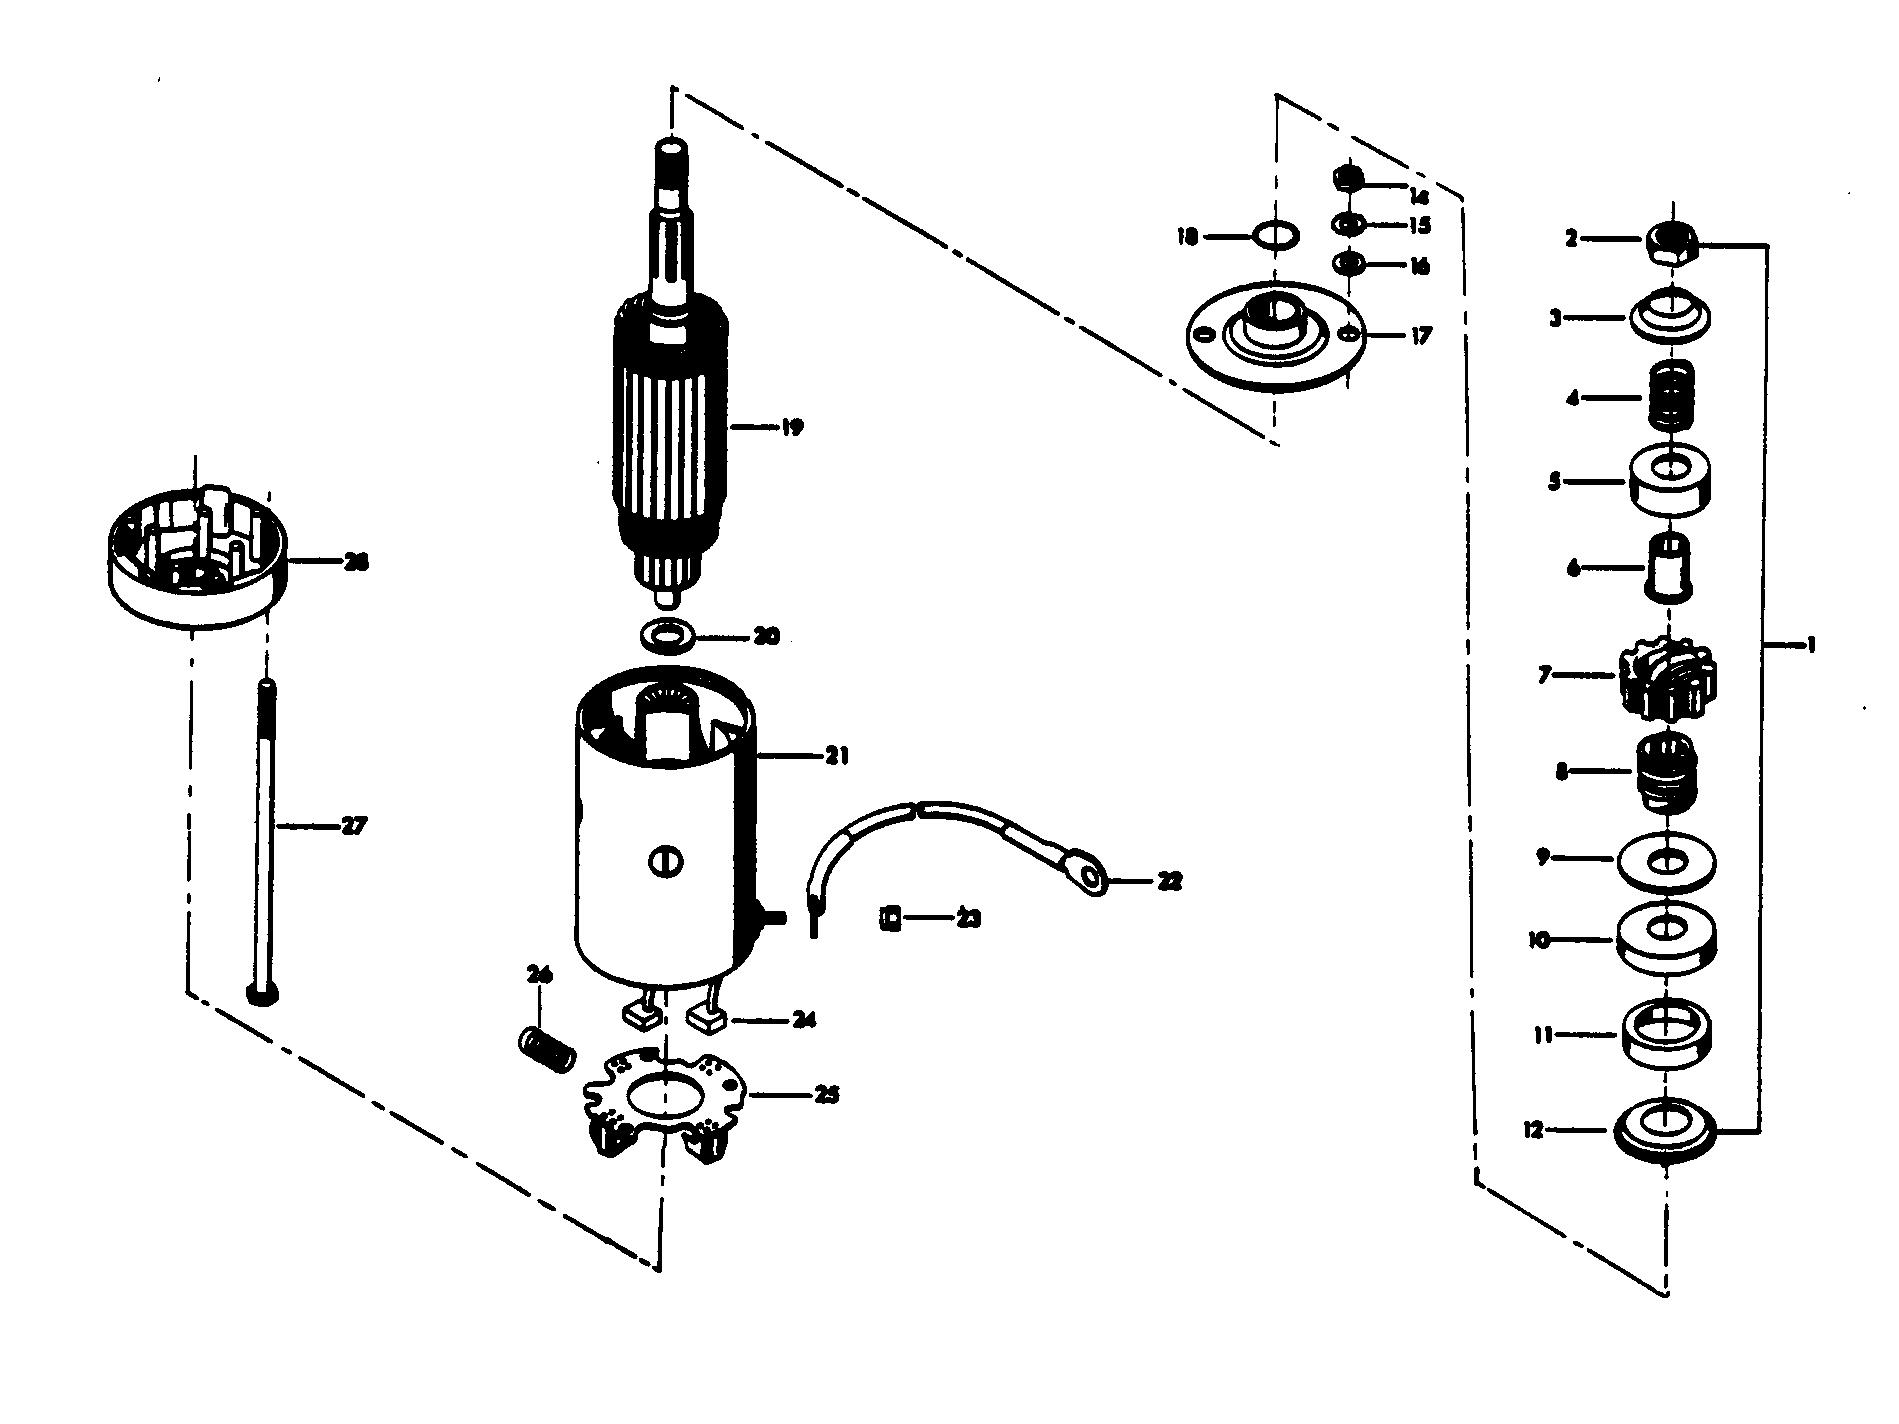 hight resolution of  chrysler 45 1979 457b9k diagram of 45 1979 mercury chrysler outboard 459h9h alternator and